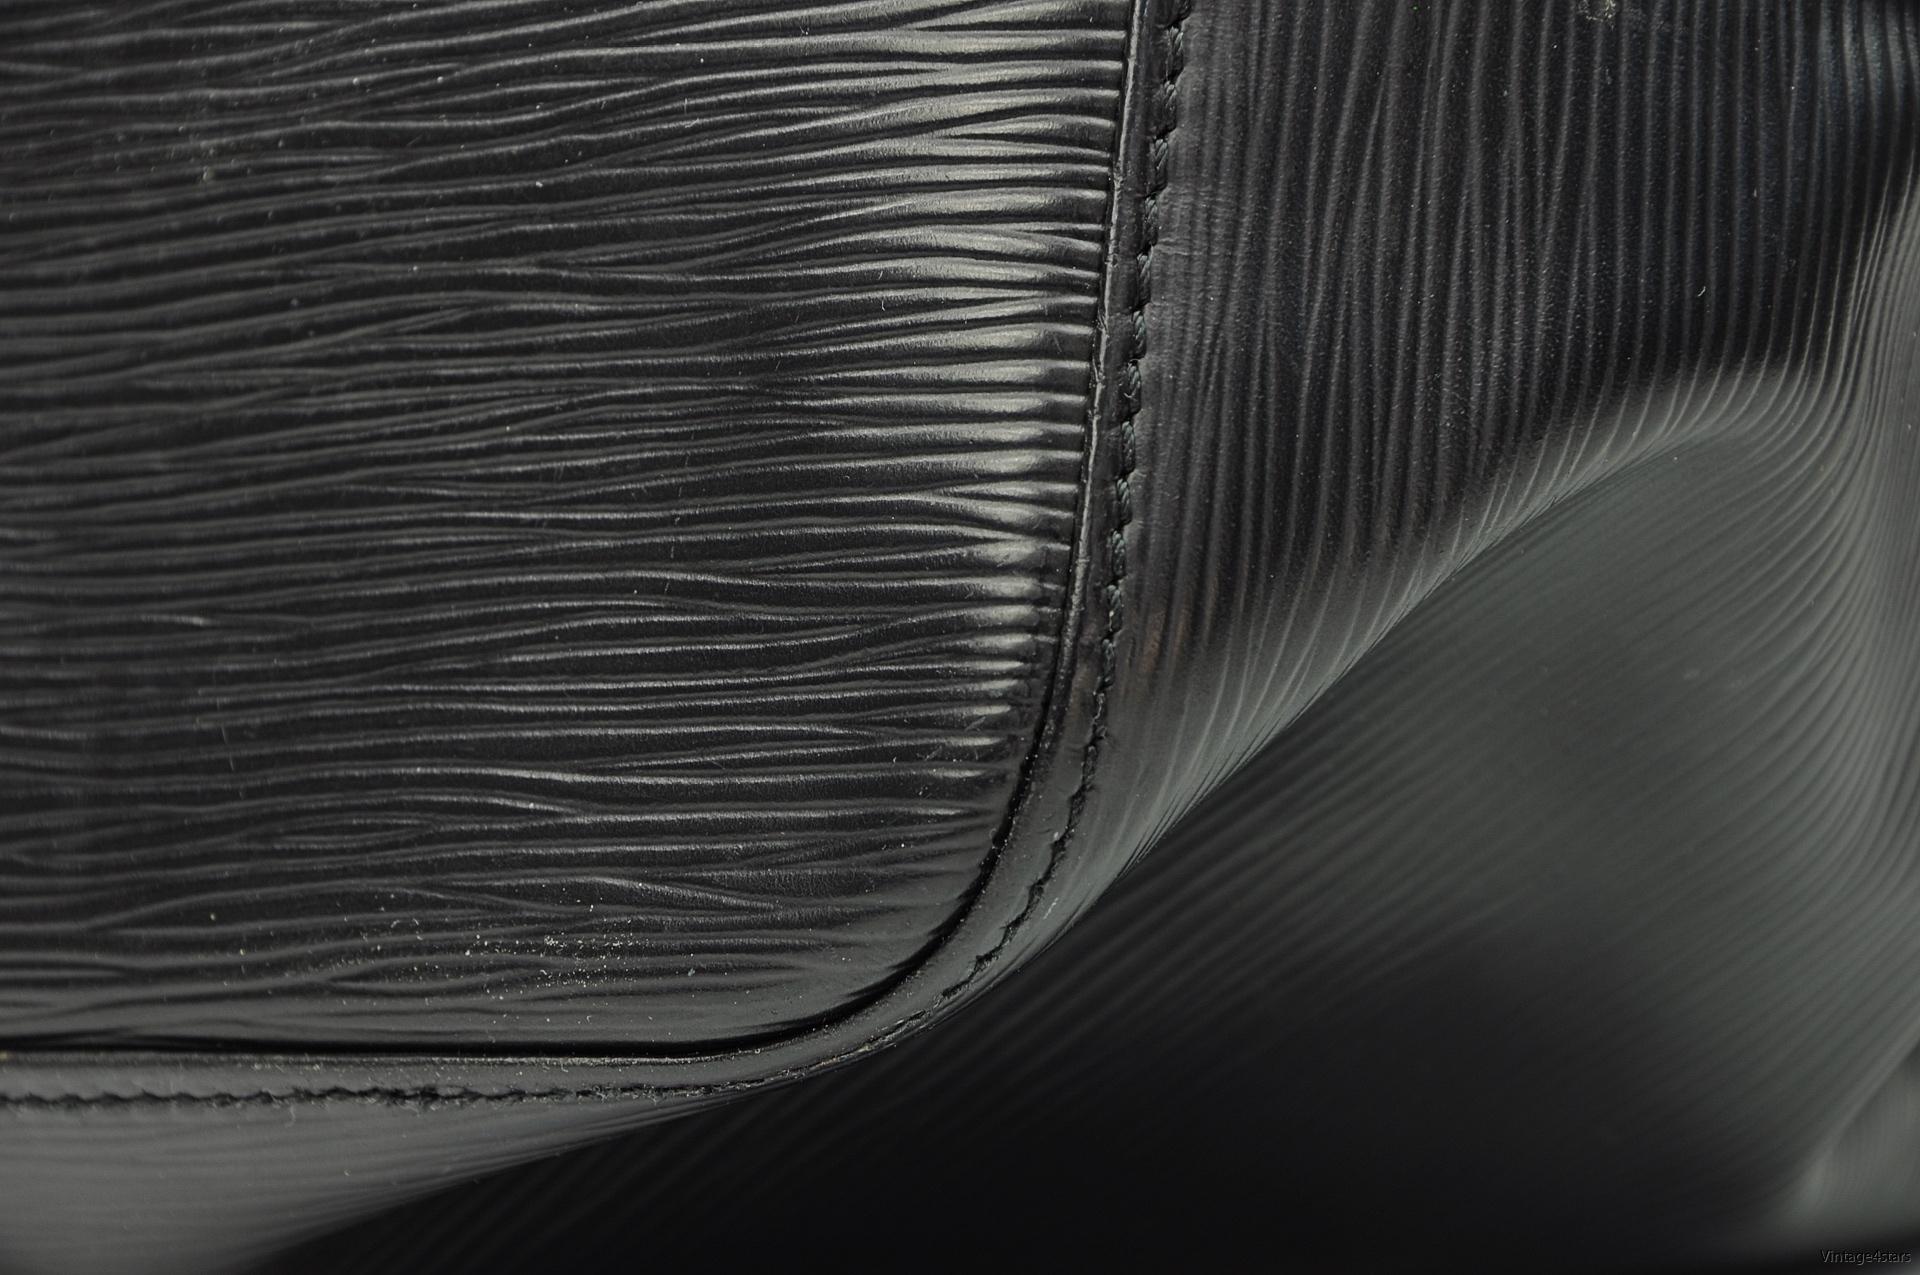 Louis Vuitton Petit Noe Epi 3